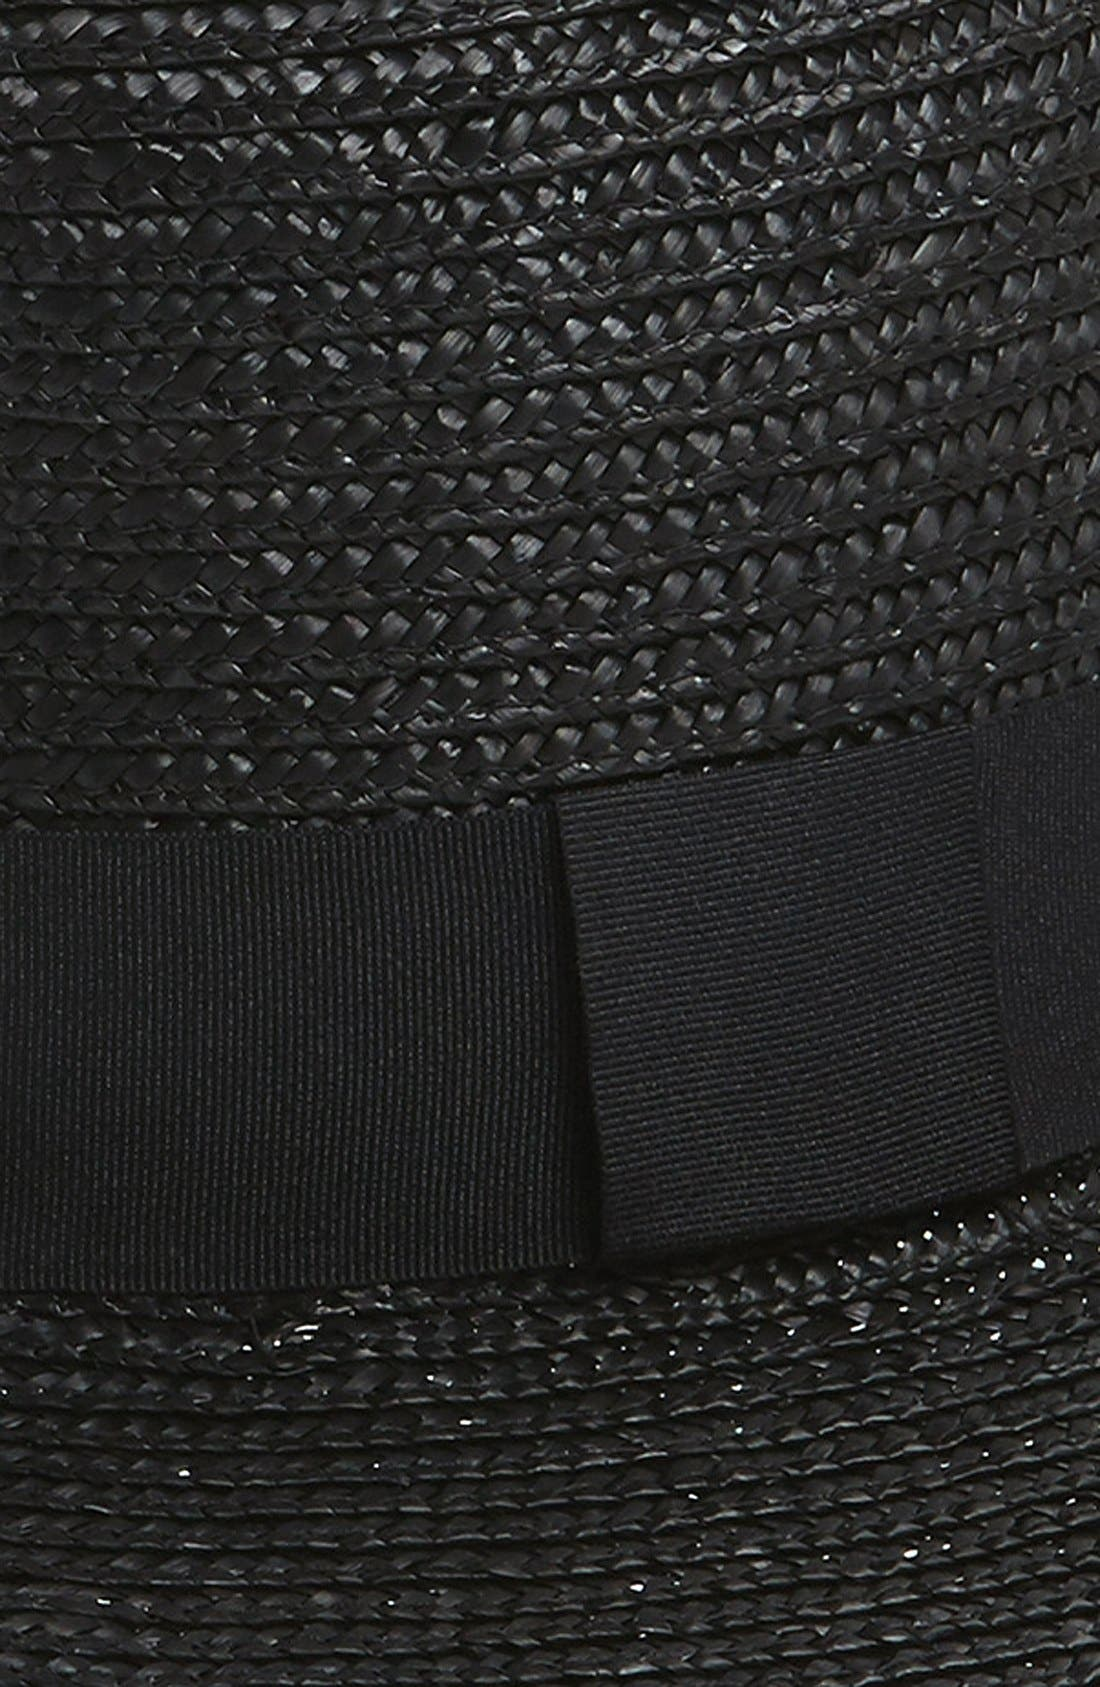 Wide Brim Boater Hat,                             Alternate thumbnail 2, color,                             001